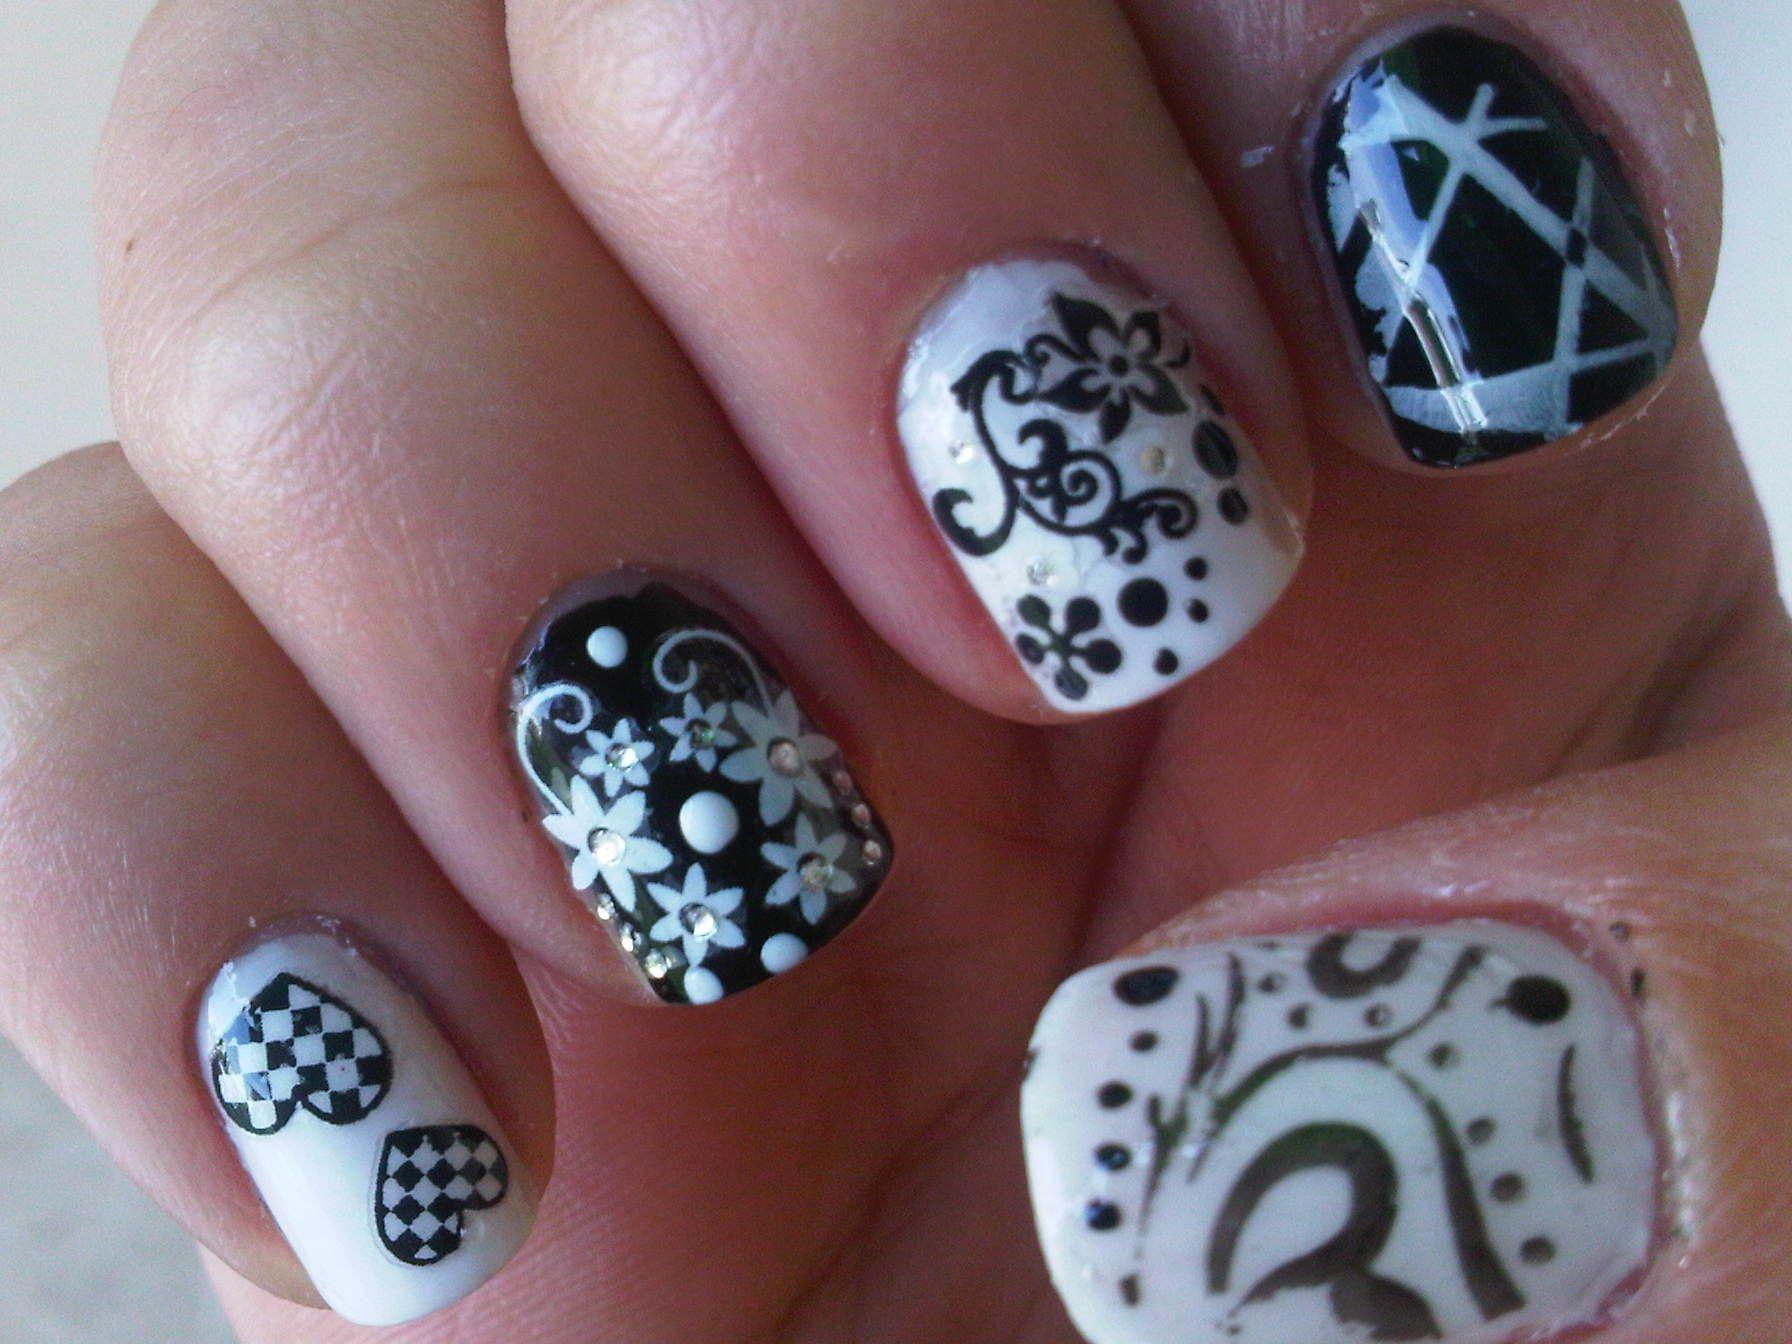 Cute nail designs black 445 days ago black and white nails cute nail designs black 445 days ago black and white nails cool prinsesfo Choice Image